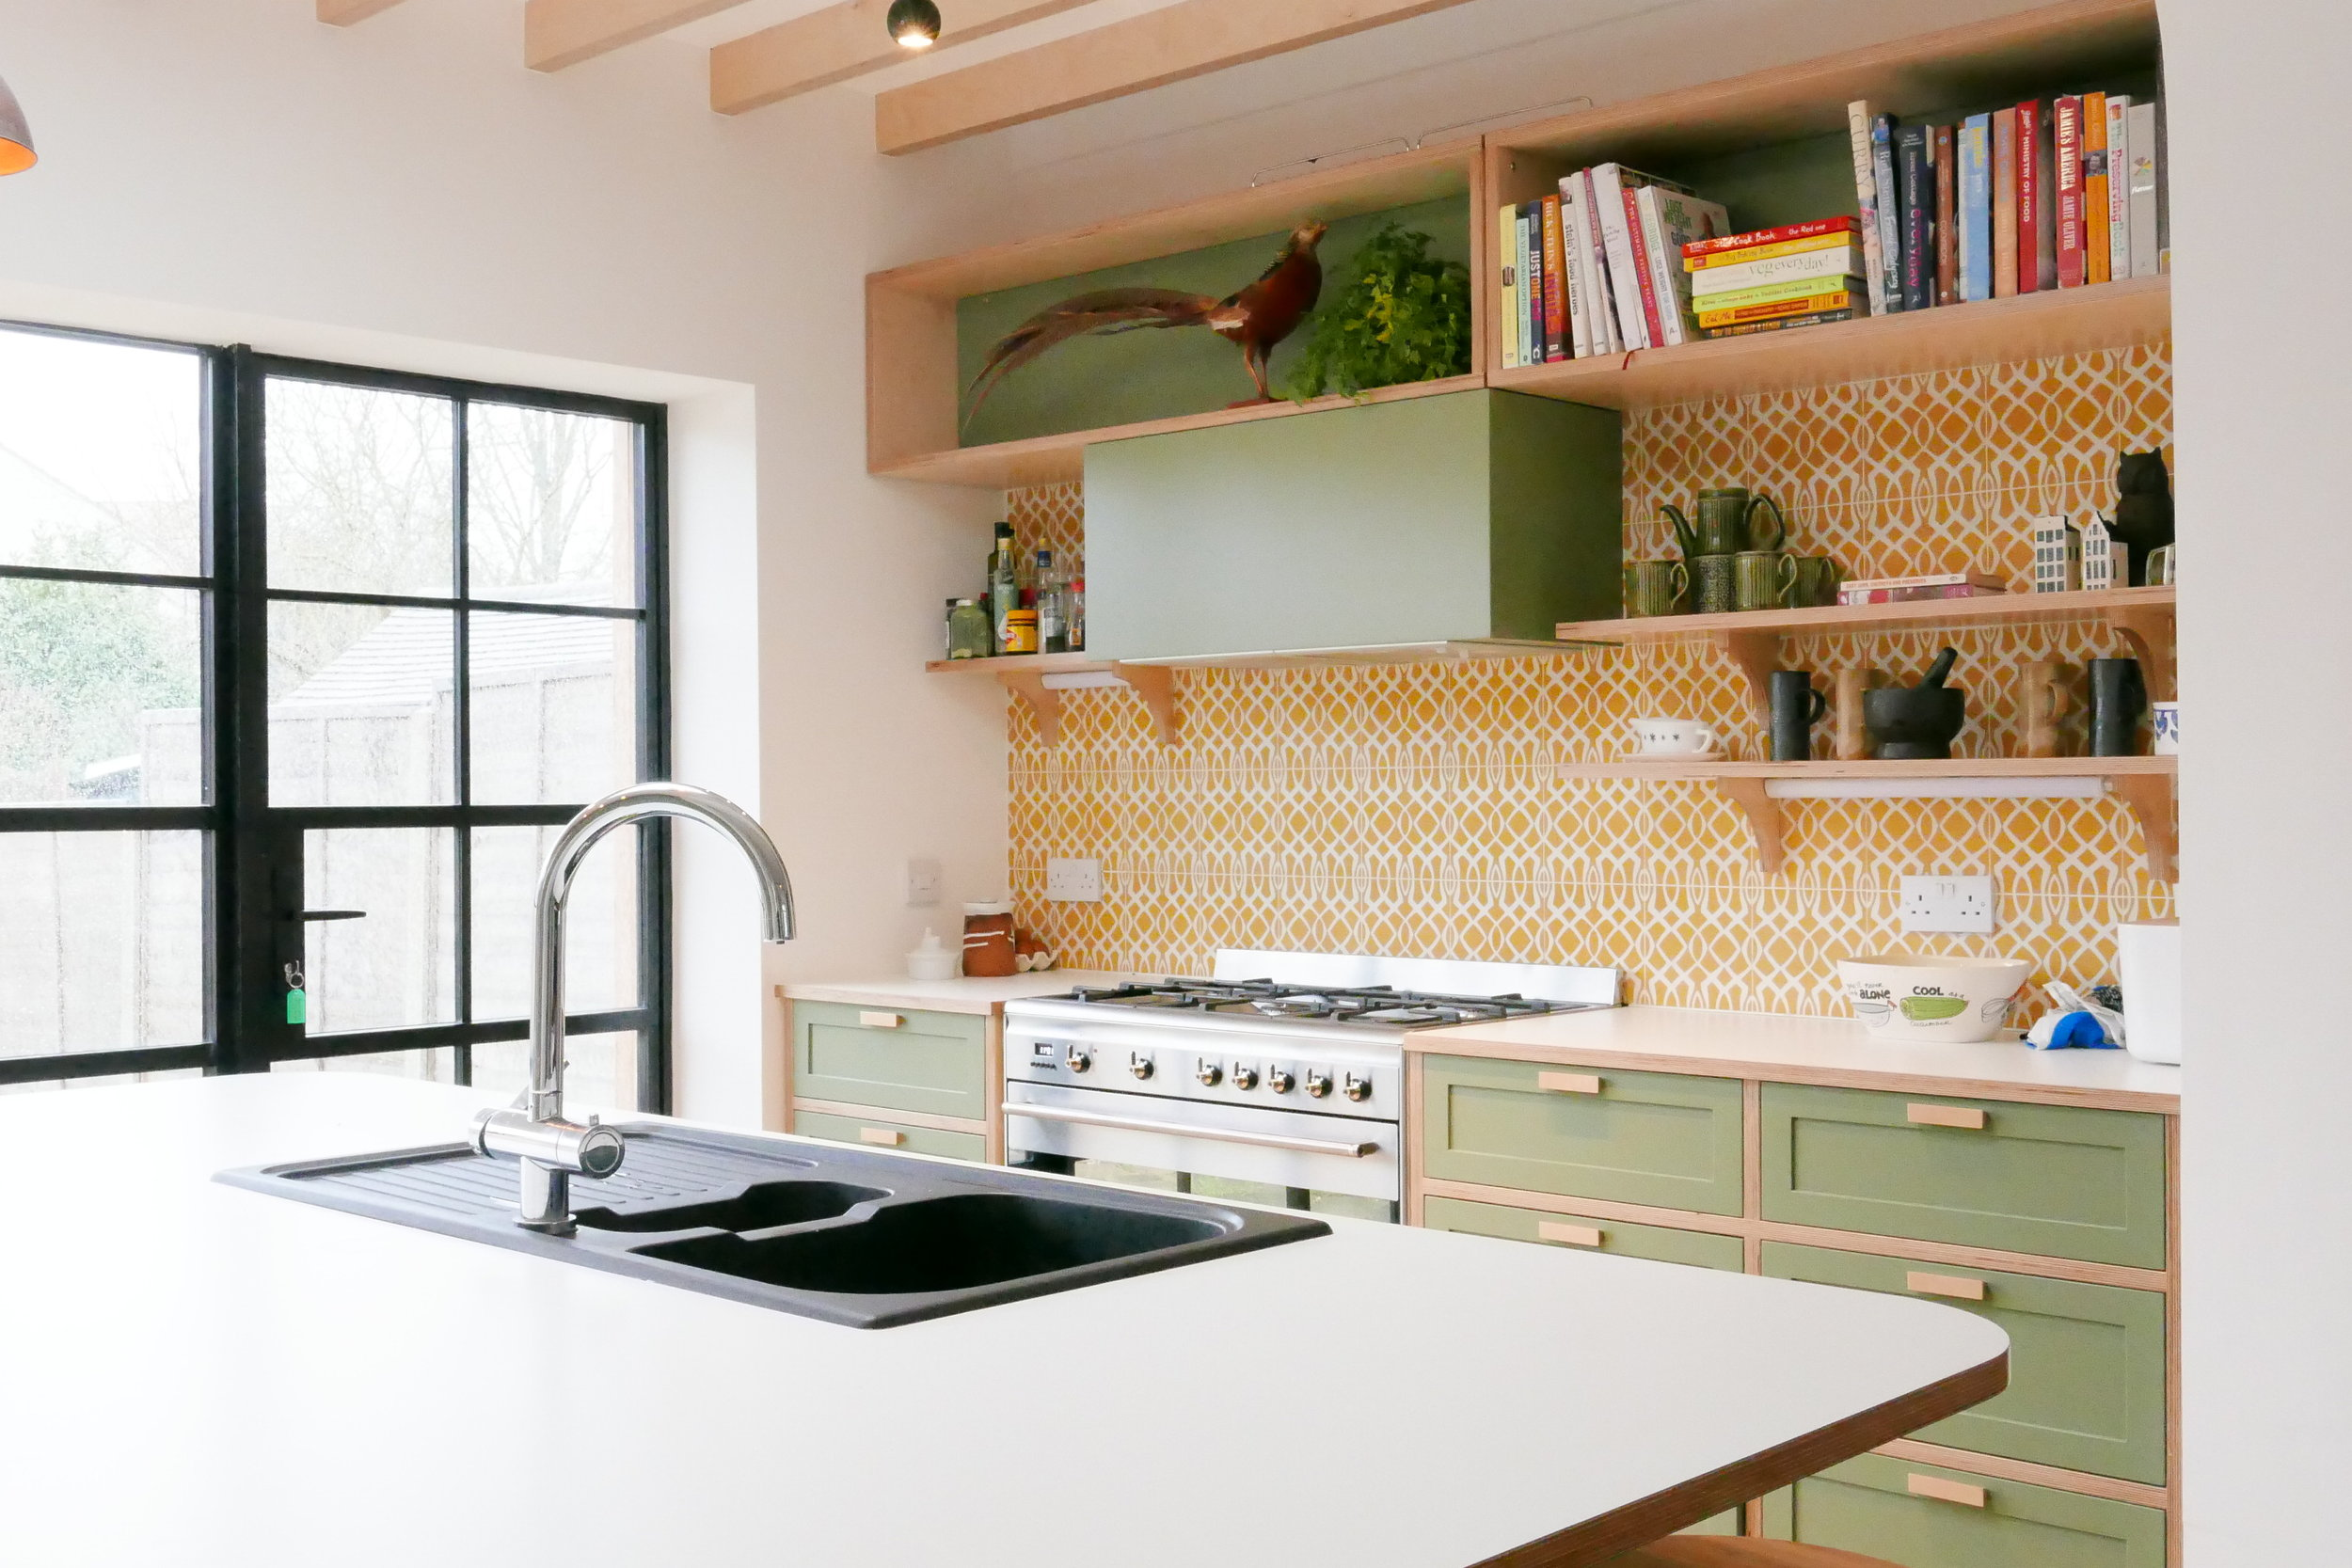 Bespoke Kitchen Design Extension Upper Walthamstow E17